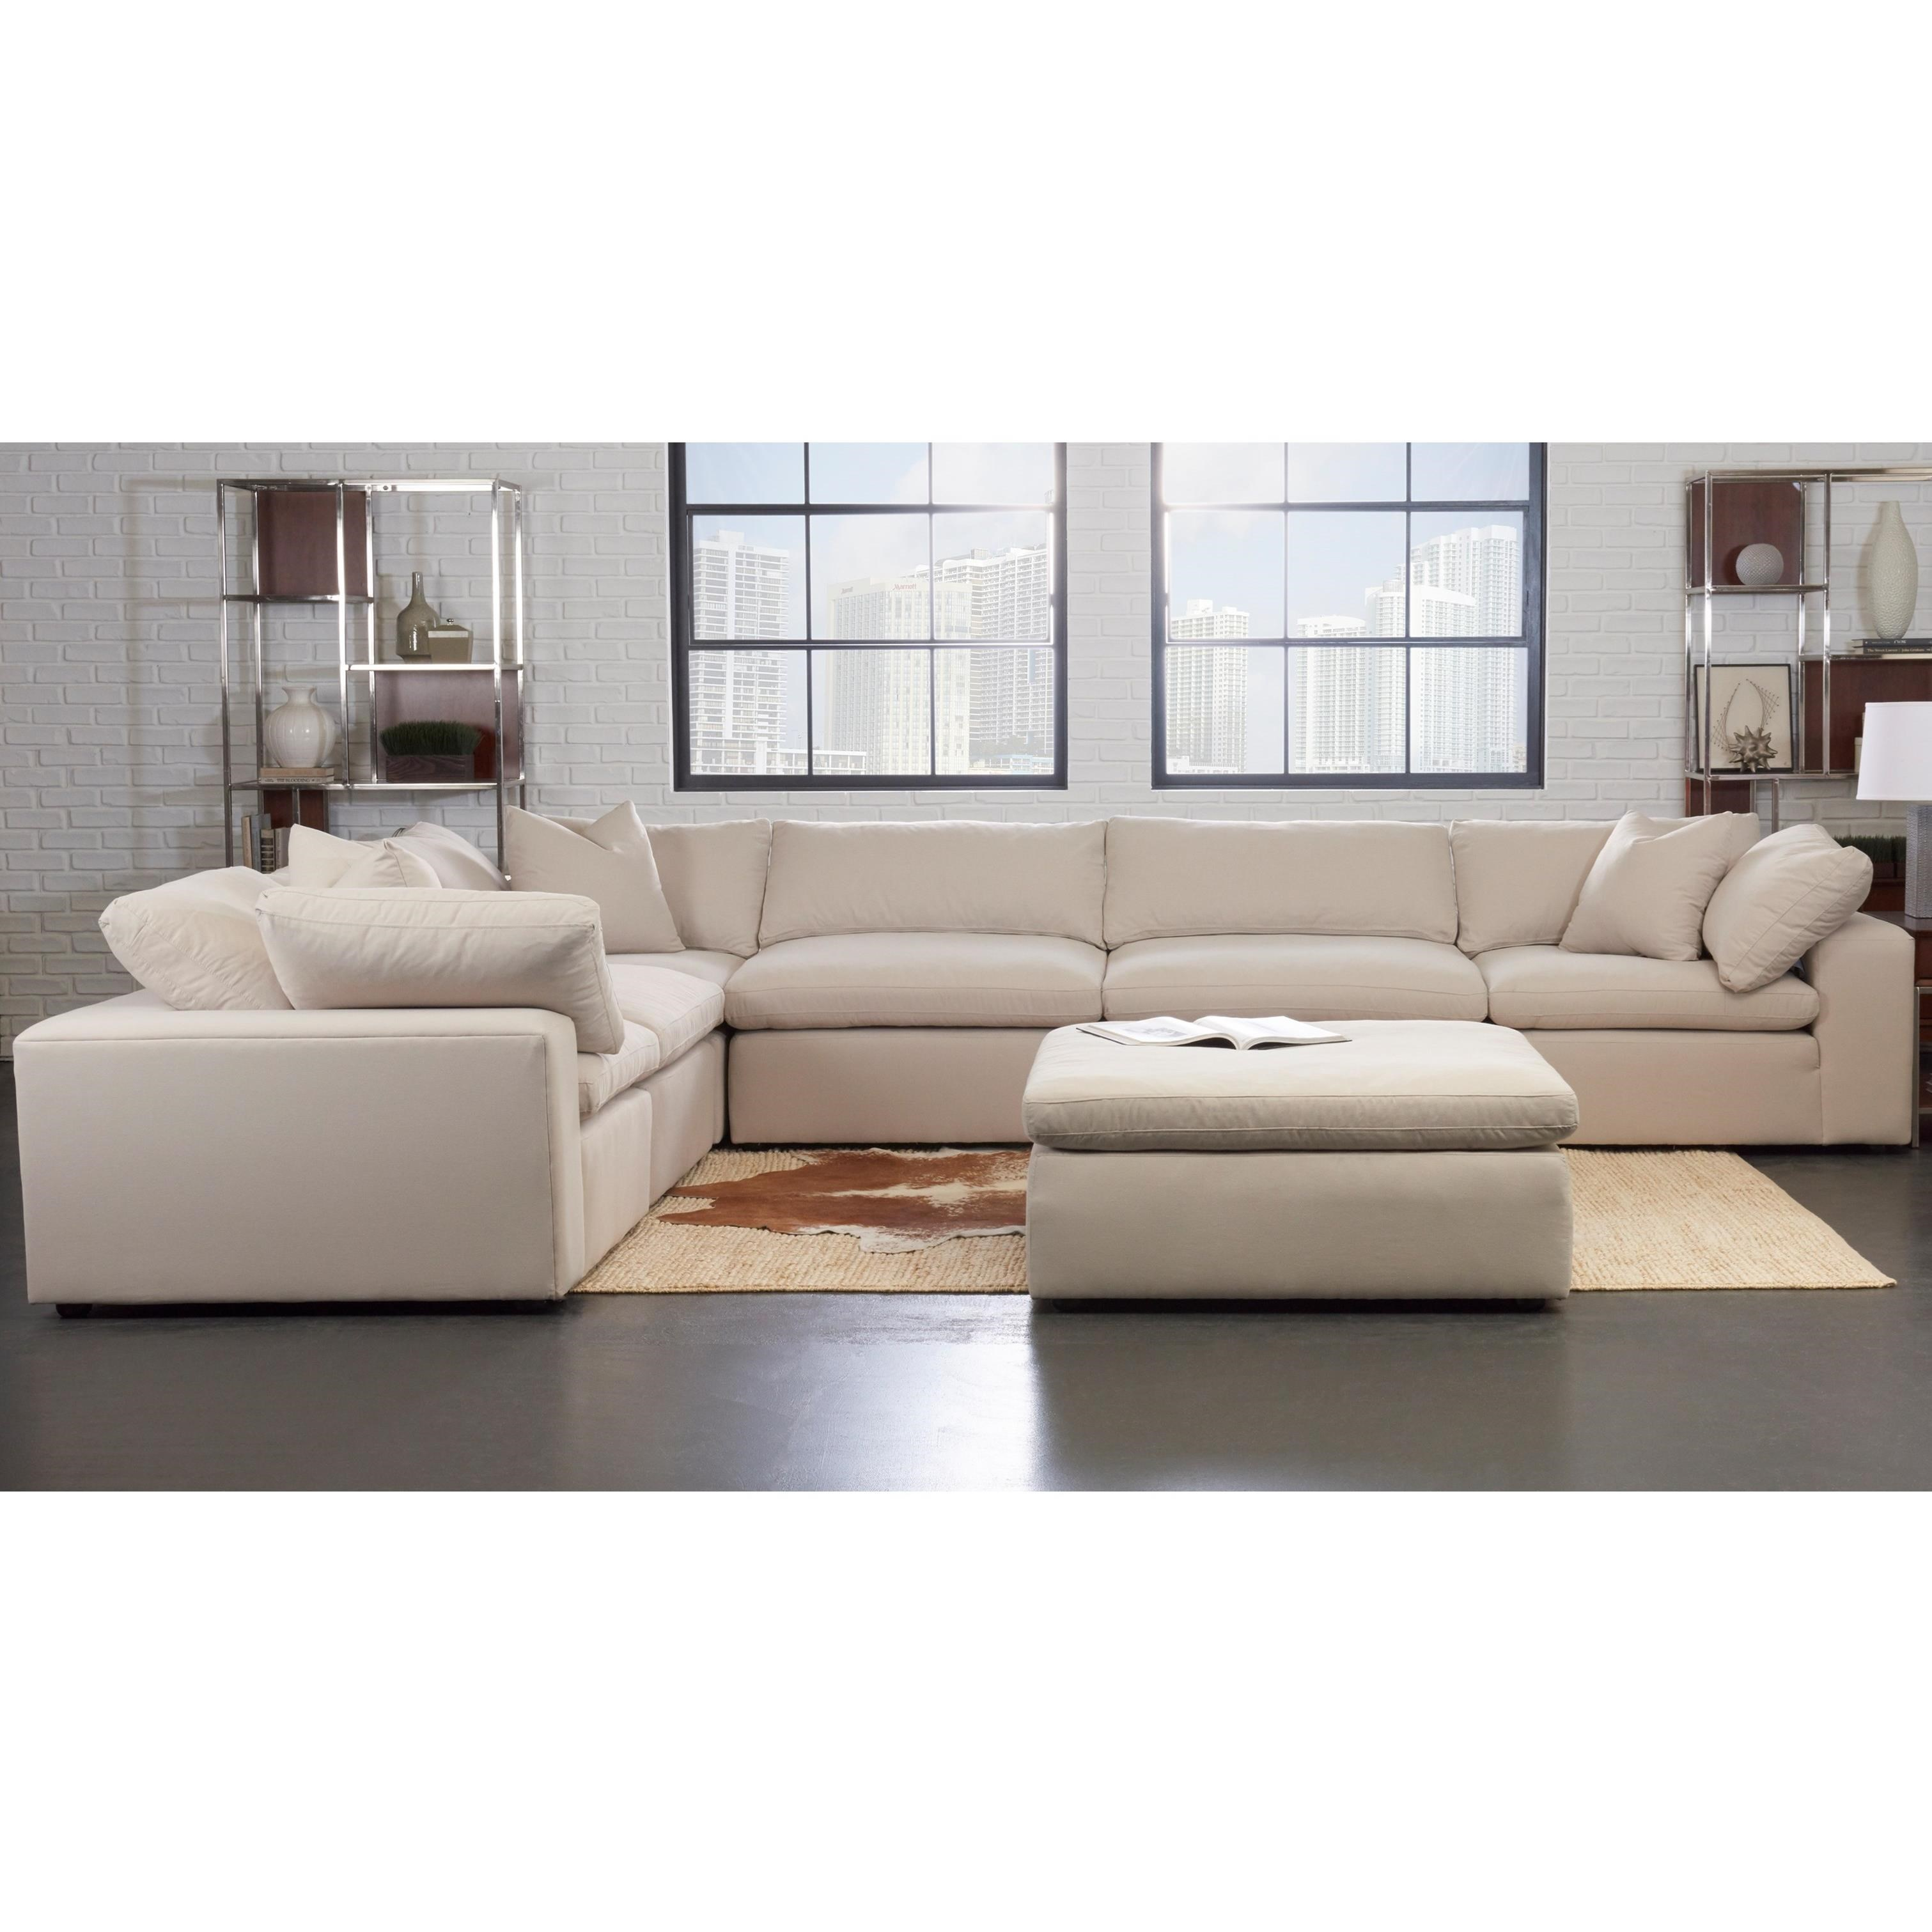 Klaussner MontereyModular Sectional Sofa